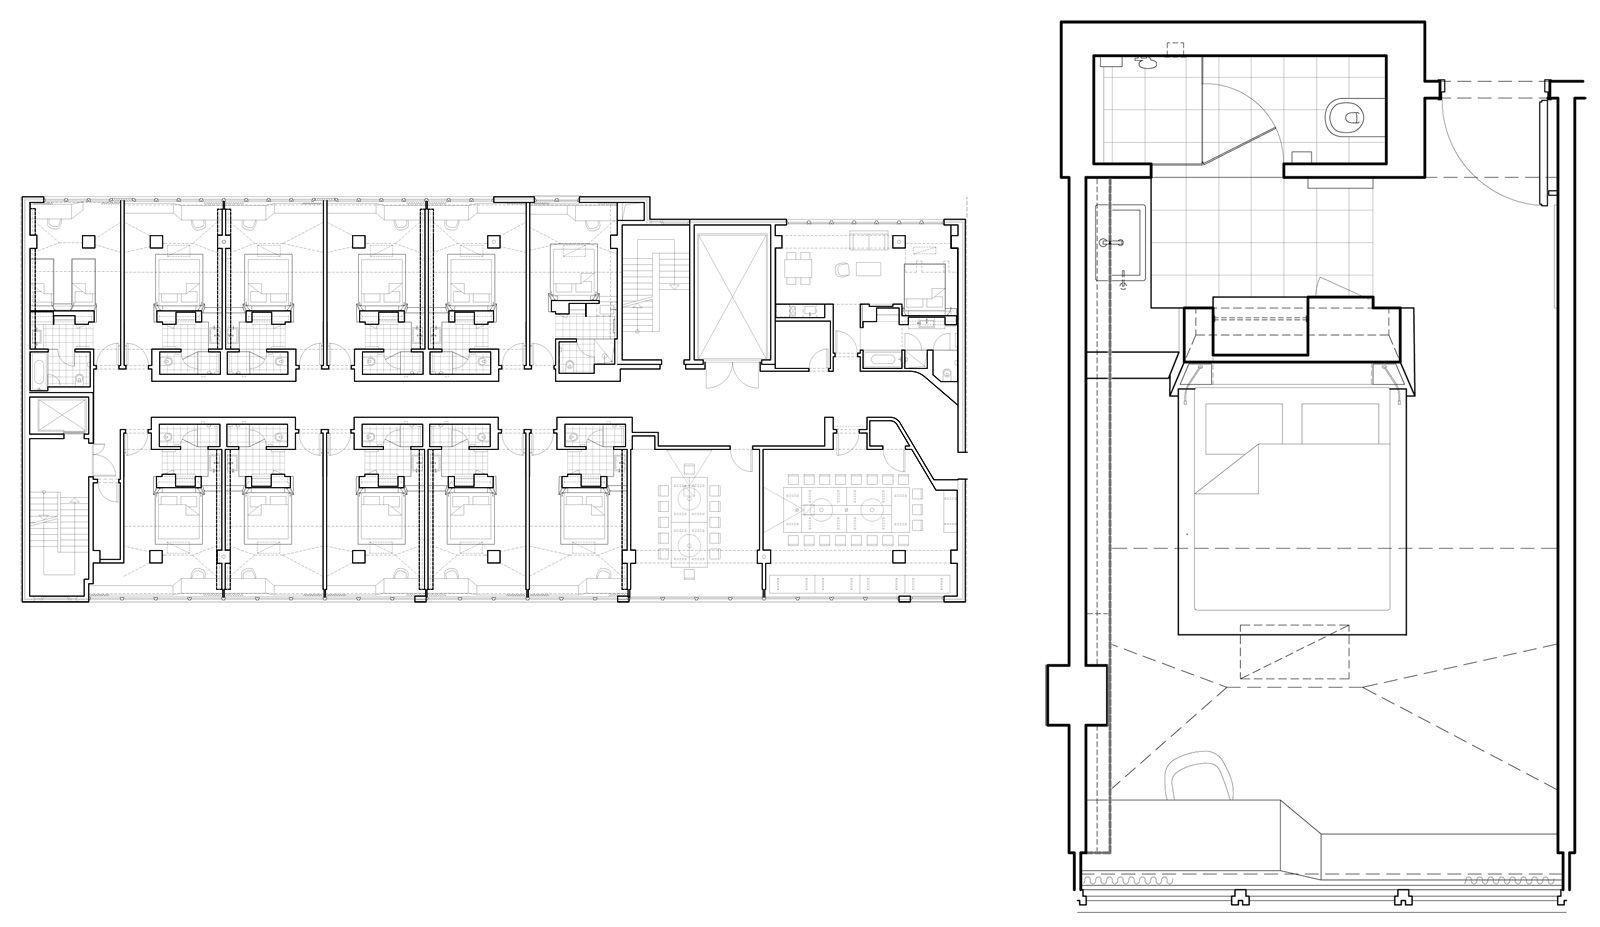 Small Hotel Room Floor Plan Bedrooms Small Hotel Room Hotel Room Design Hotel Floor Plan